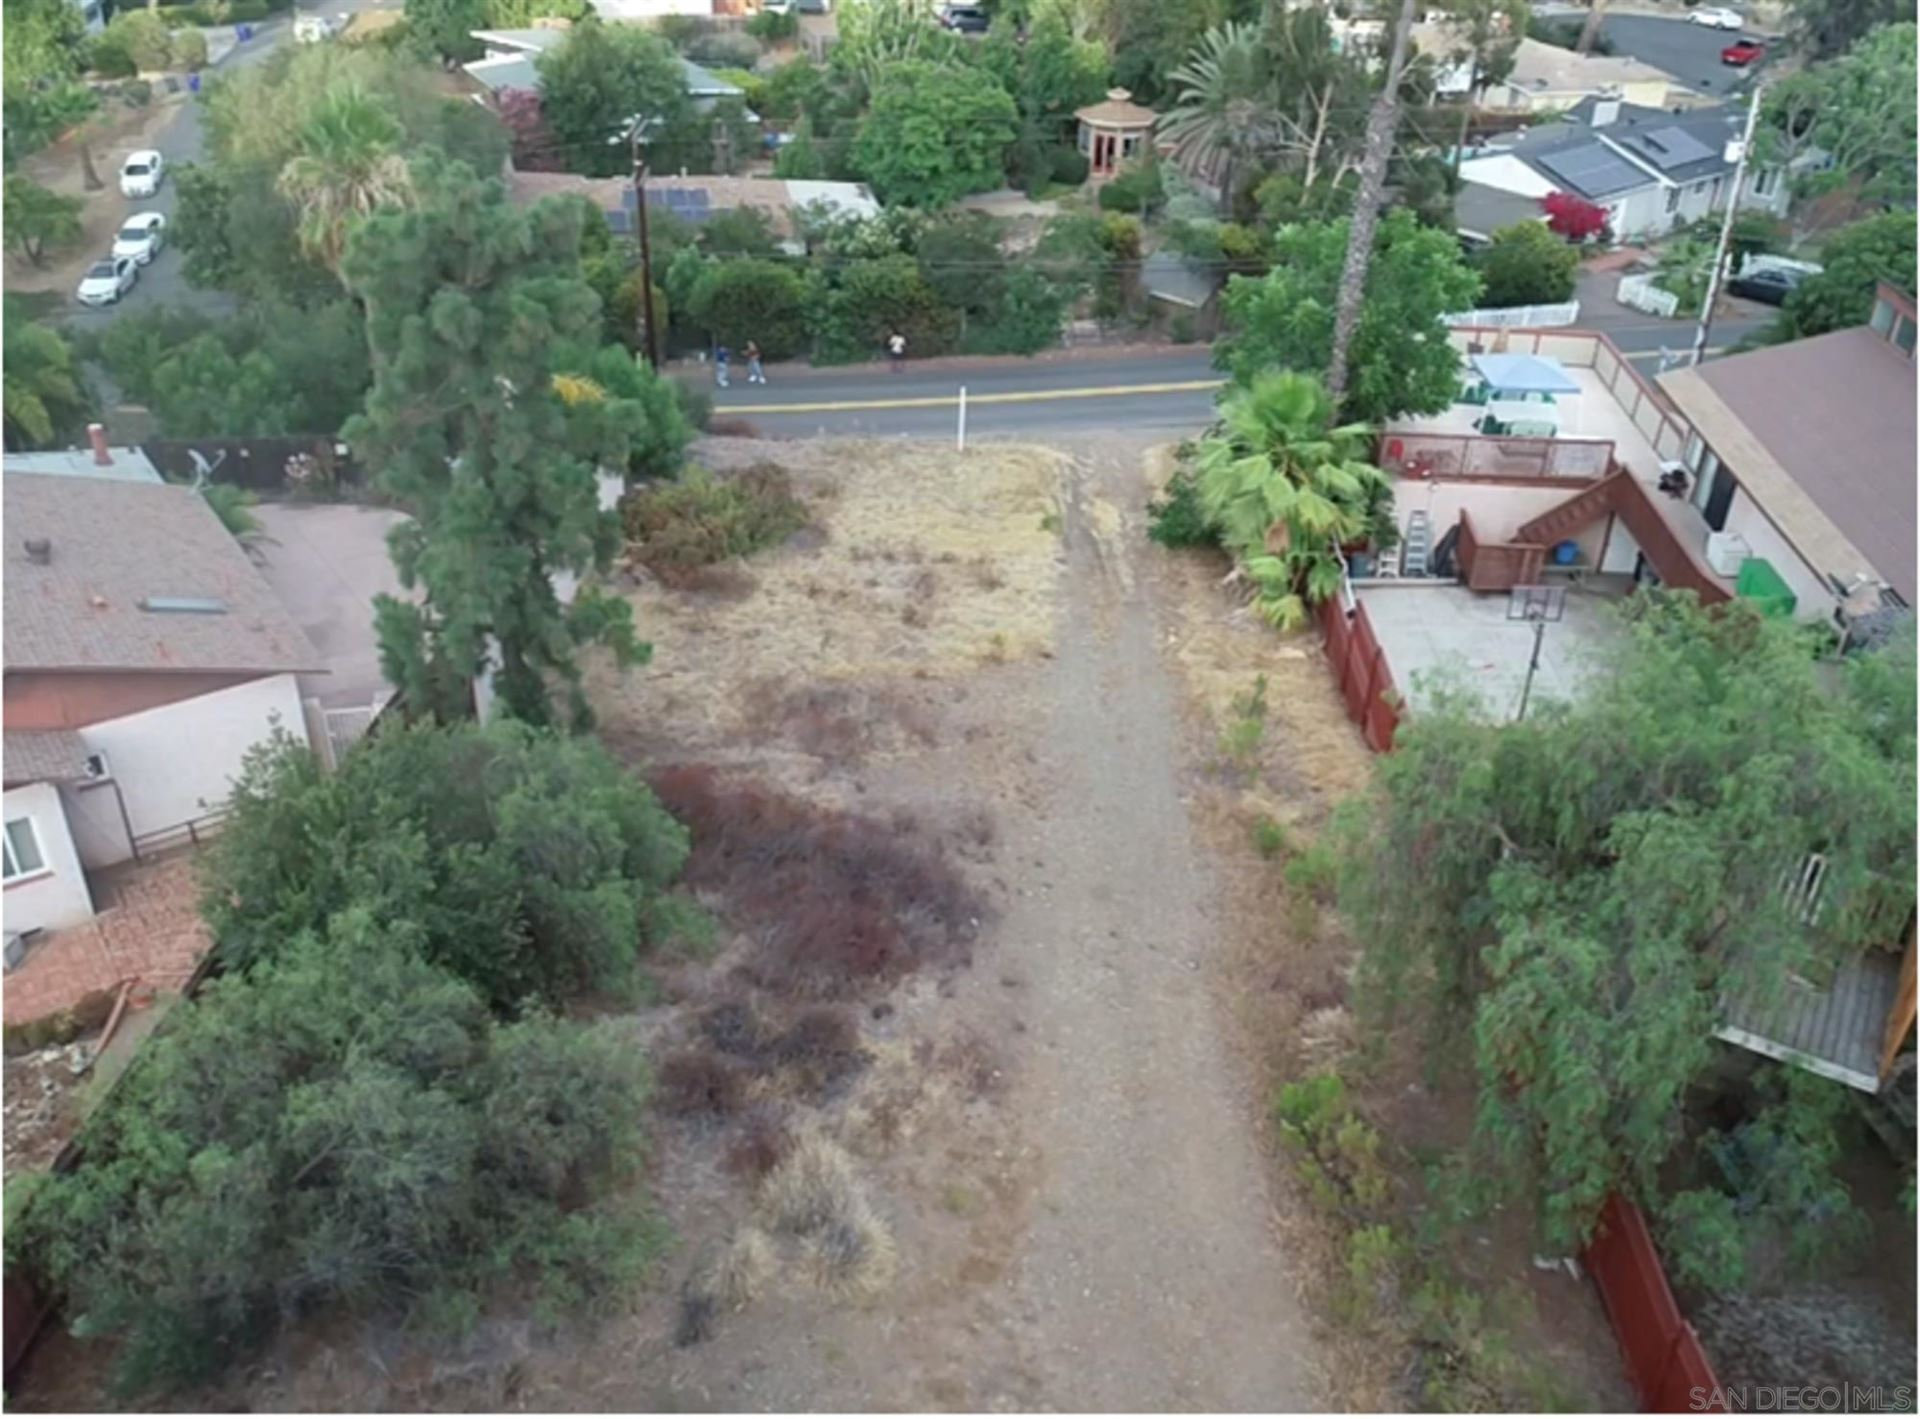 Photo of 49 Payson Rd 49, La Mesa, CA 91941 (MLS # 210021635)